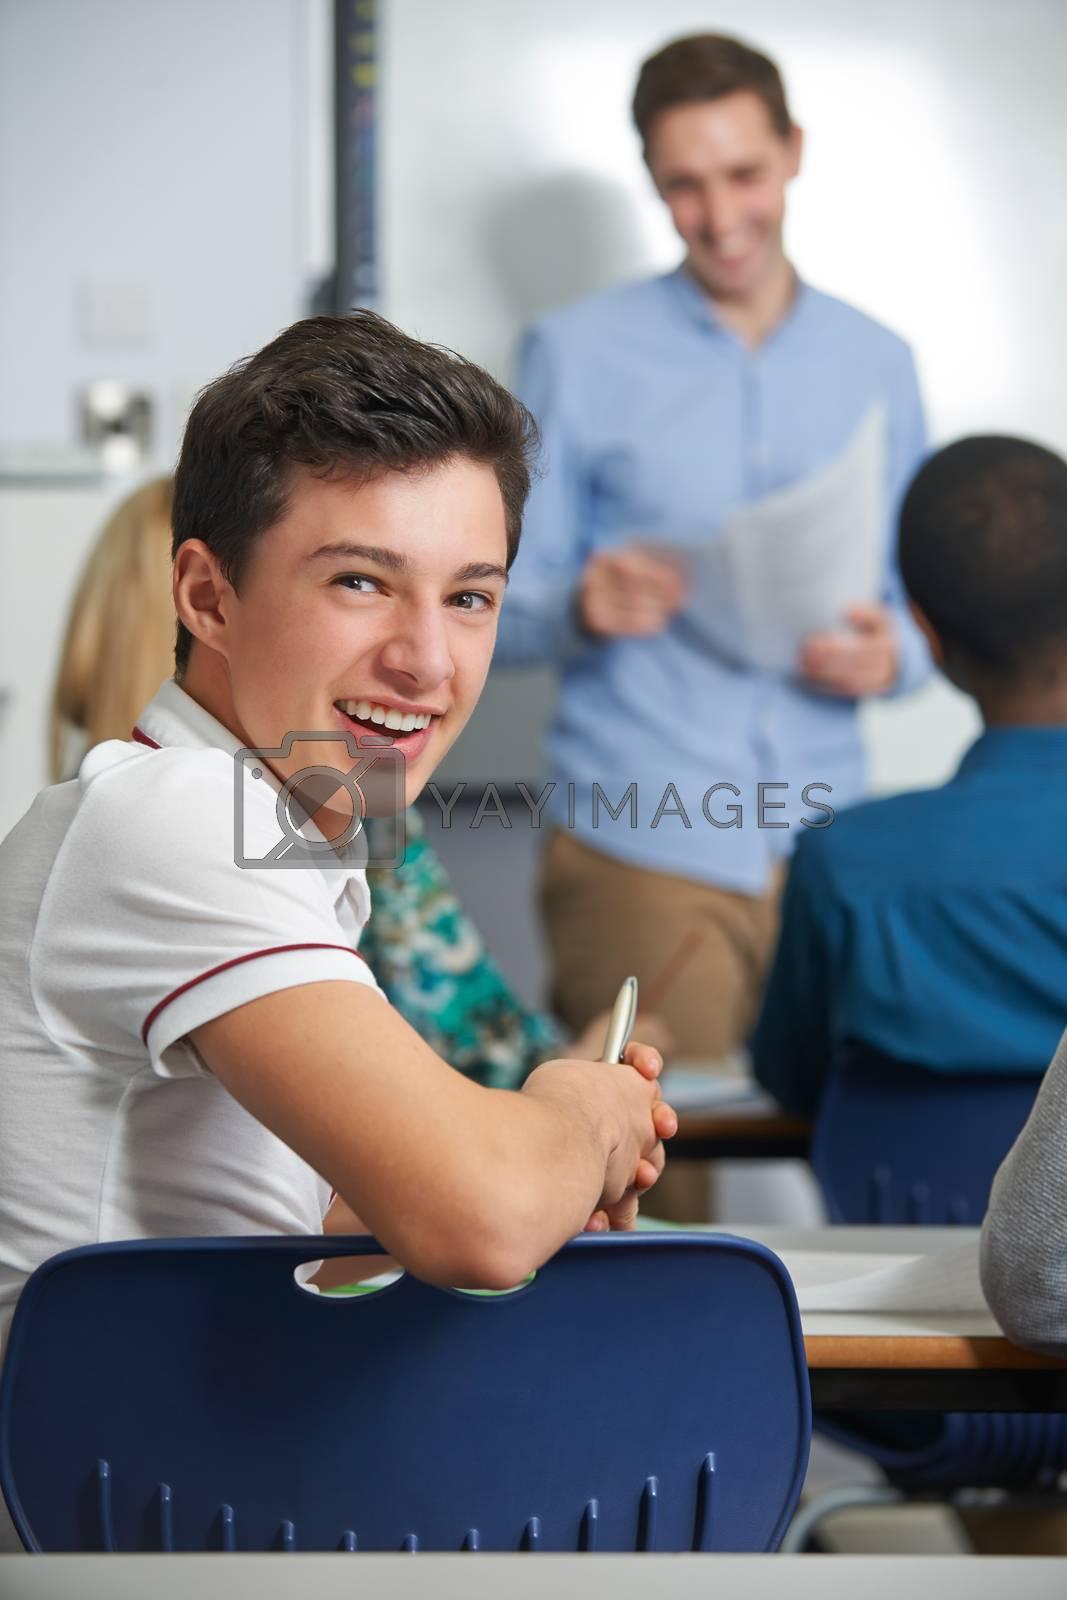 Portrait Of Male Teenage Pupil In Class